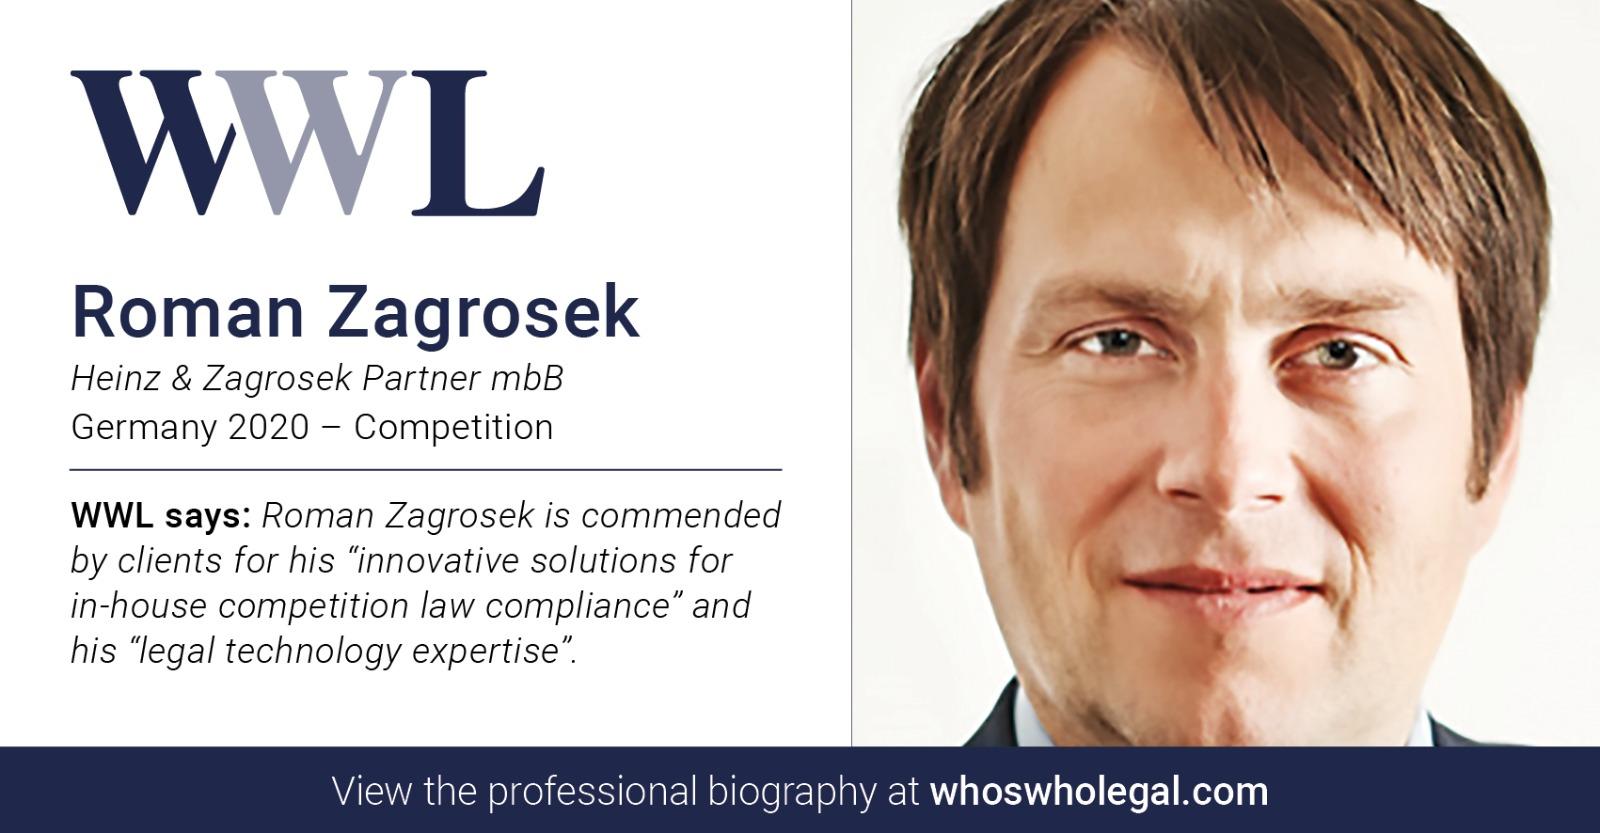 Roman Zagrosek Heinz & Zagrosek Partner mbB